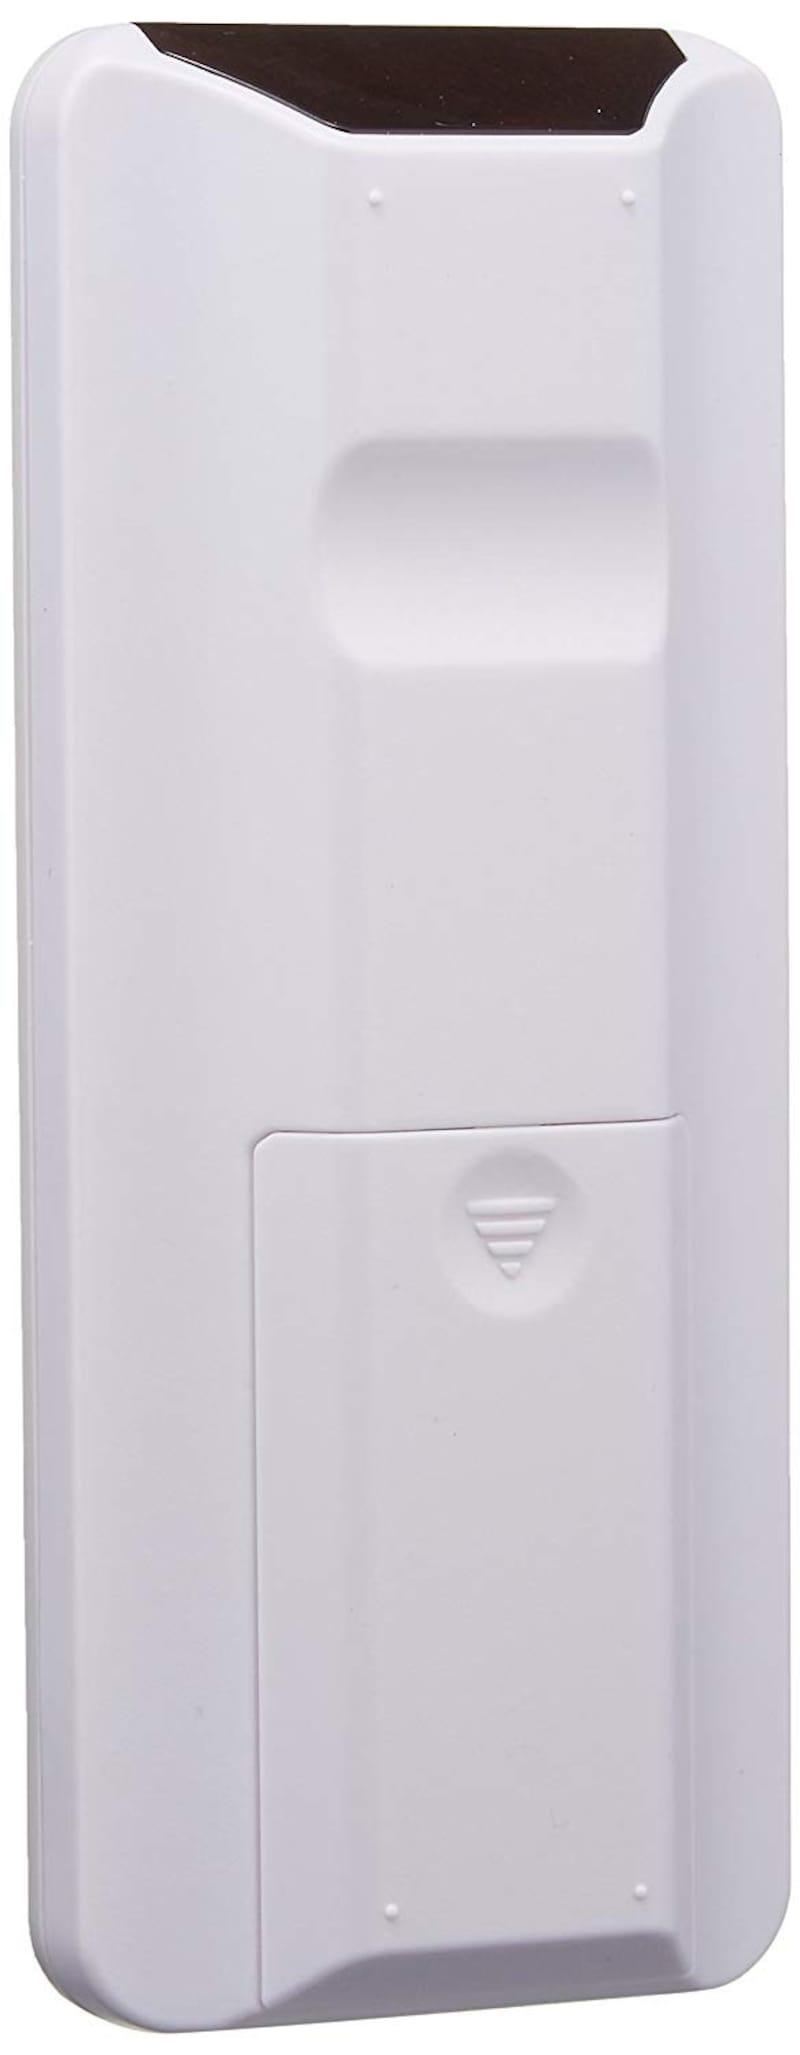 ELPA,かんたんリモコン ユニバーサルデザイン,RC-TV005UD